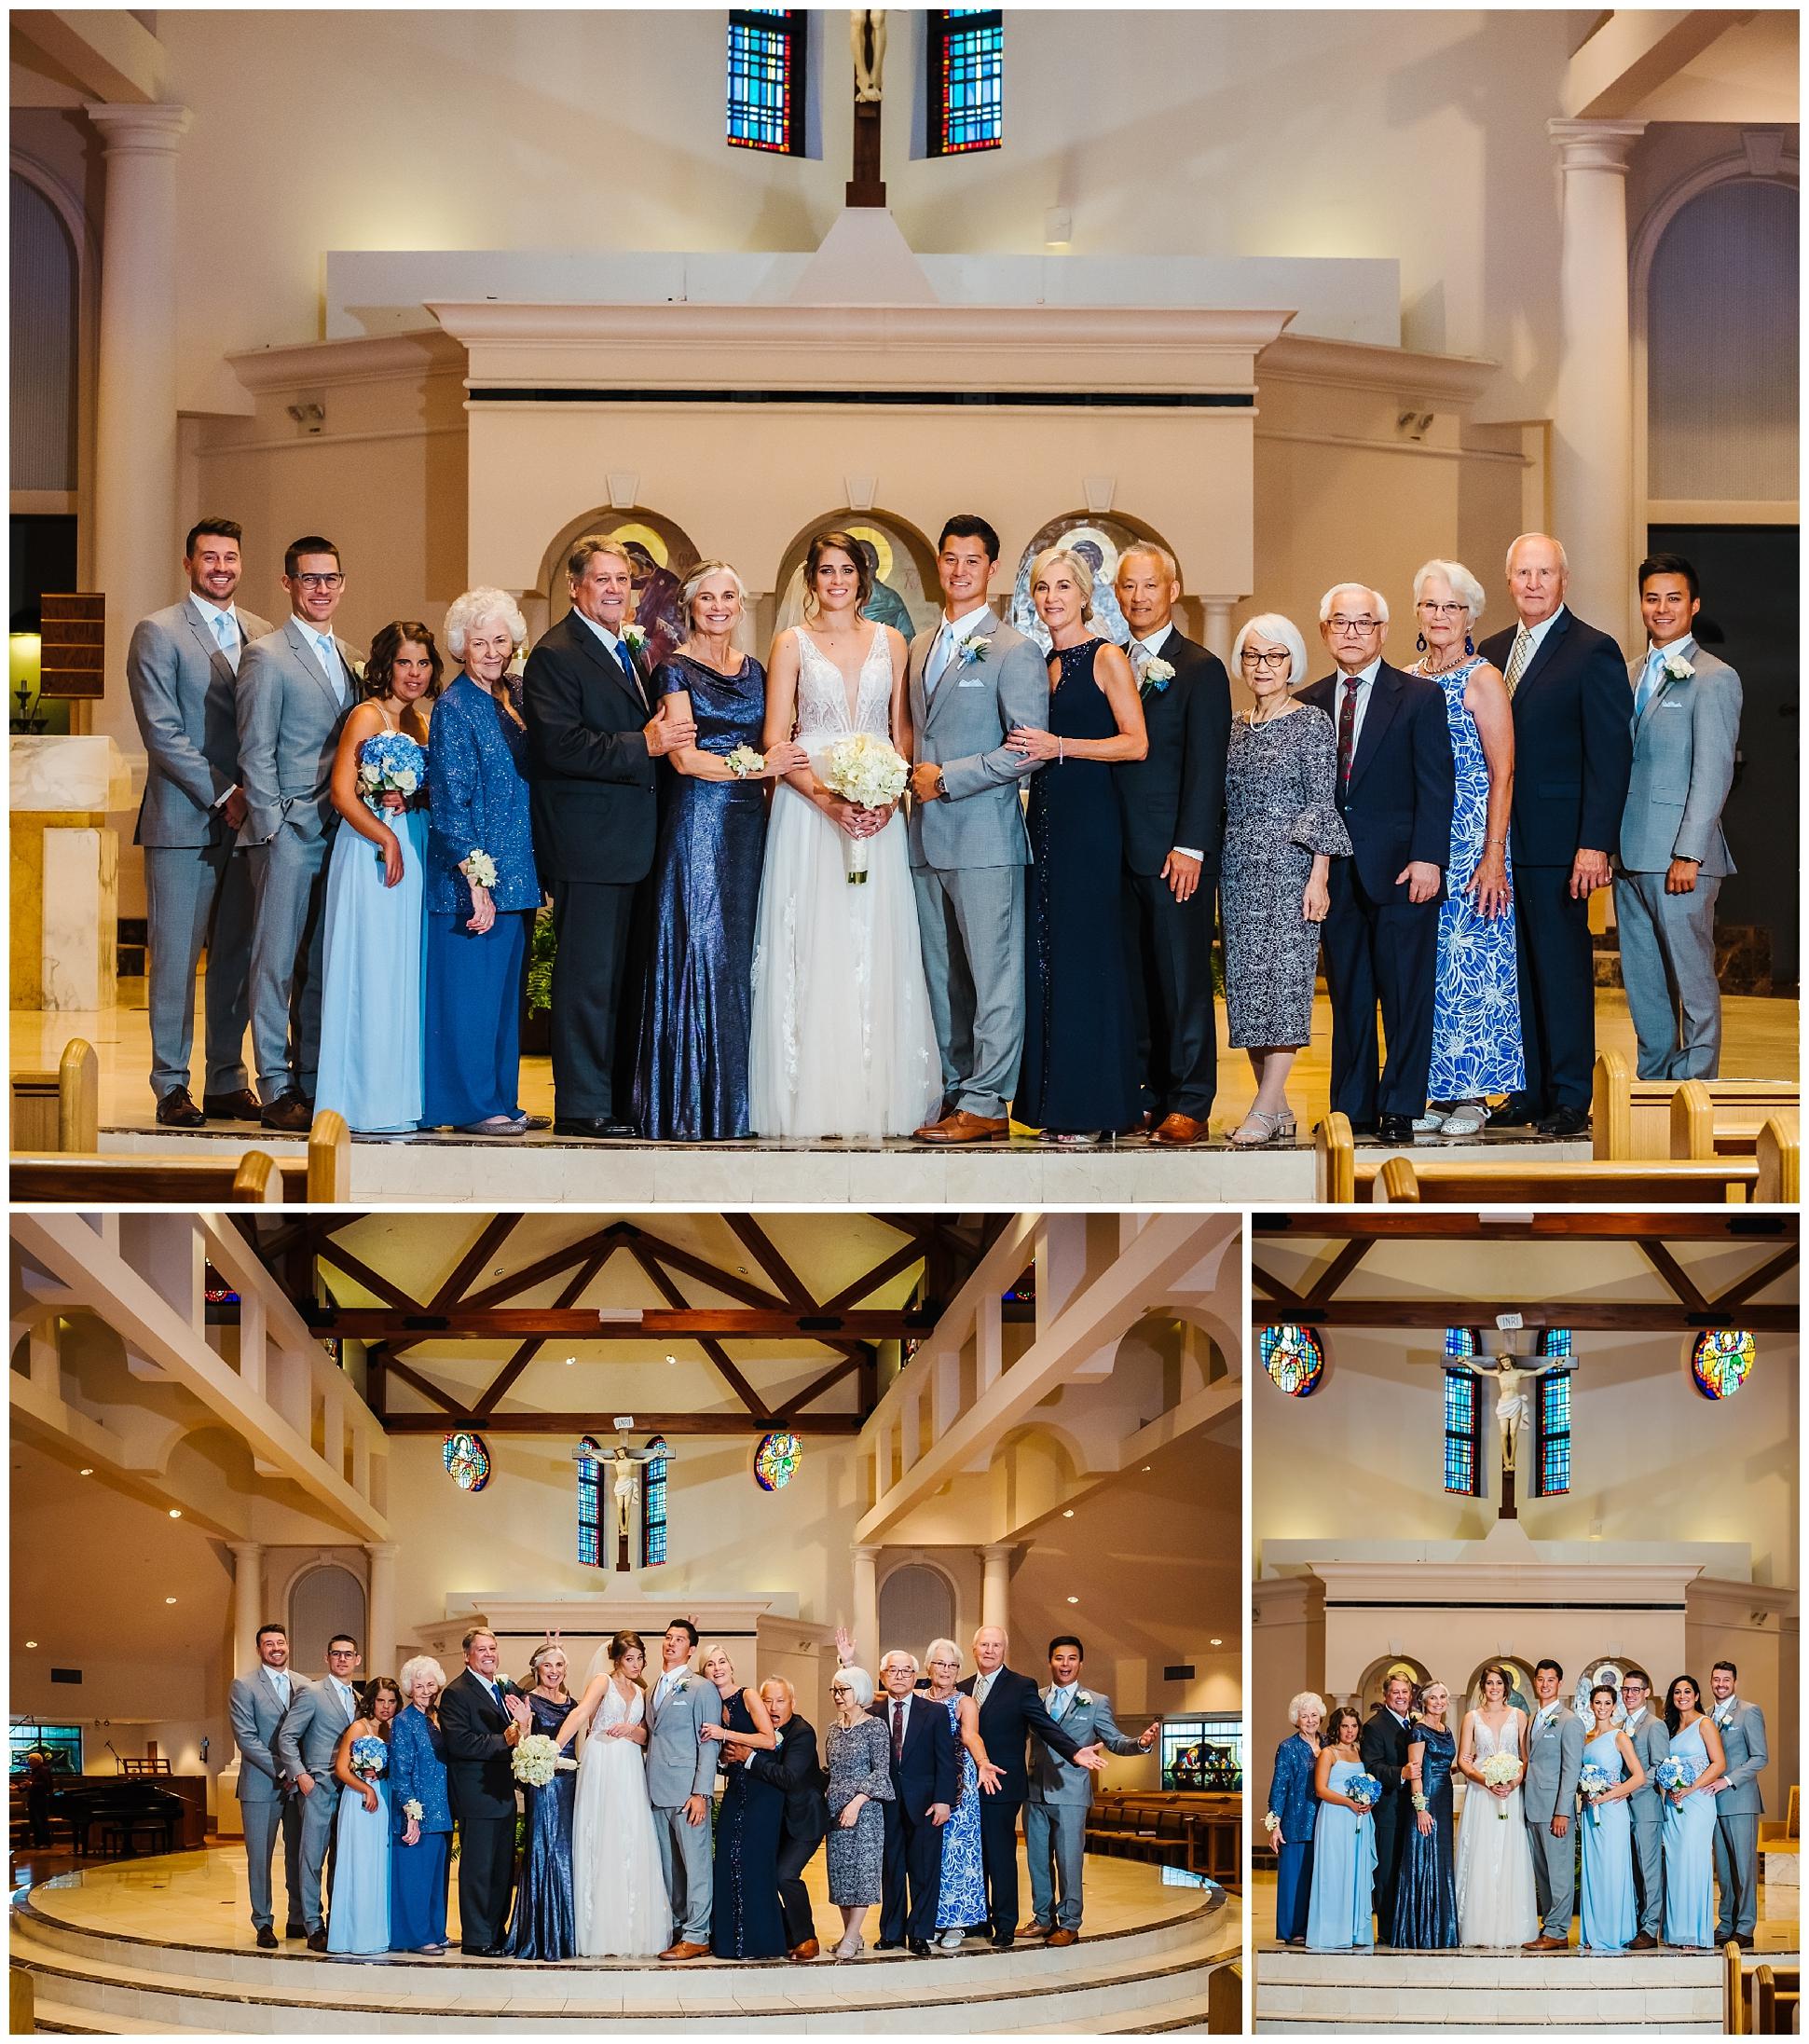 mahaffey-theater-big-military-wedding-st-pete-photographer-blue_0044.jpg